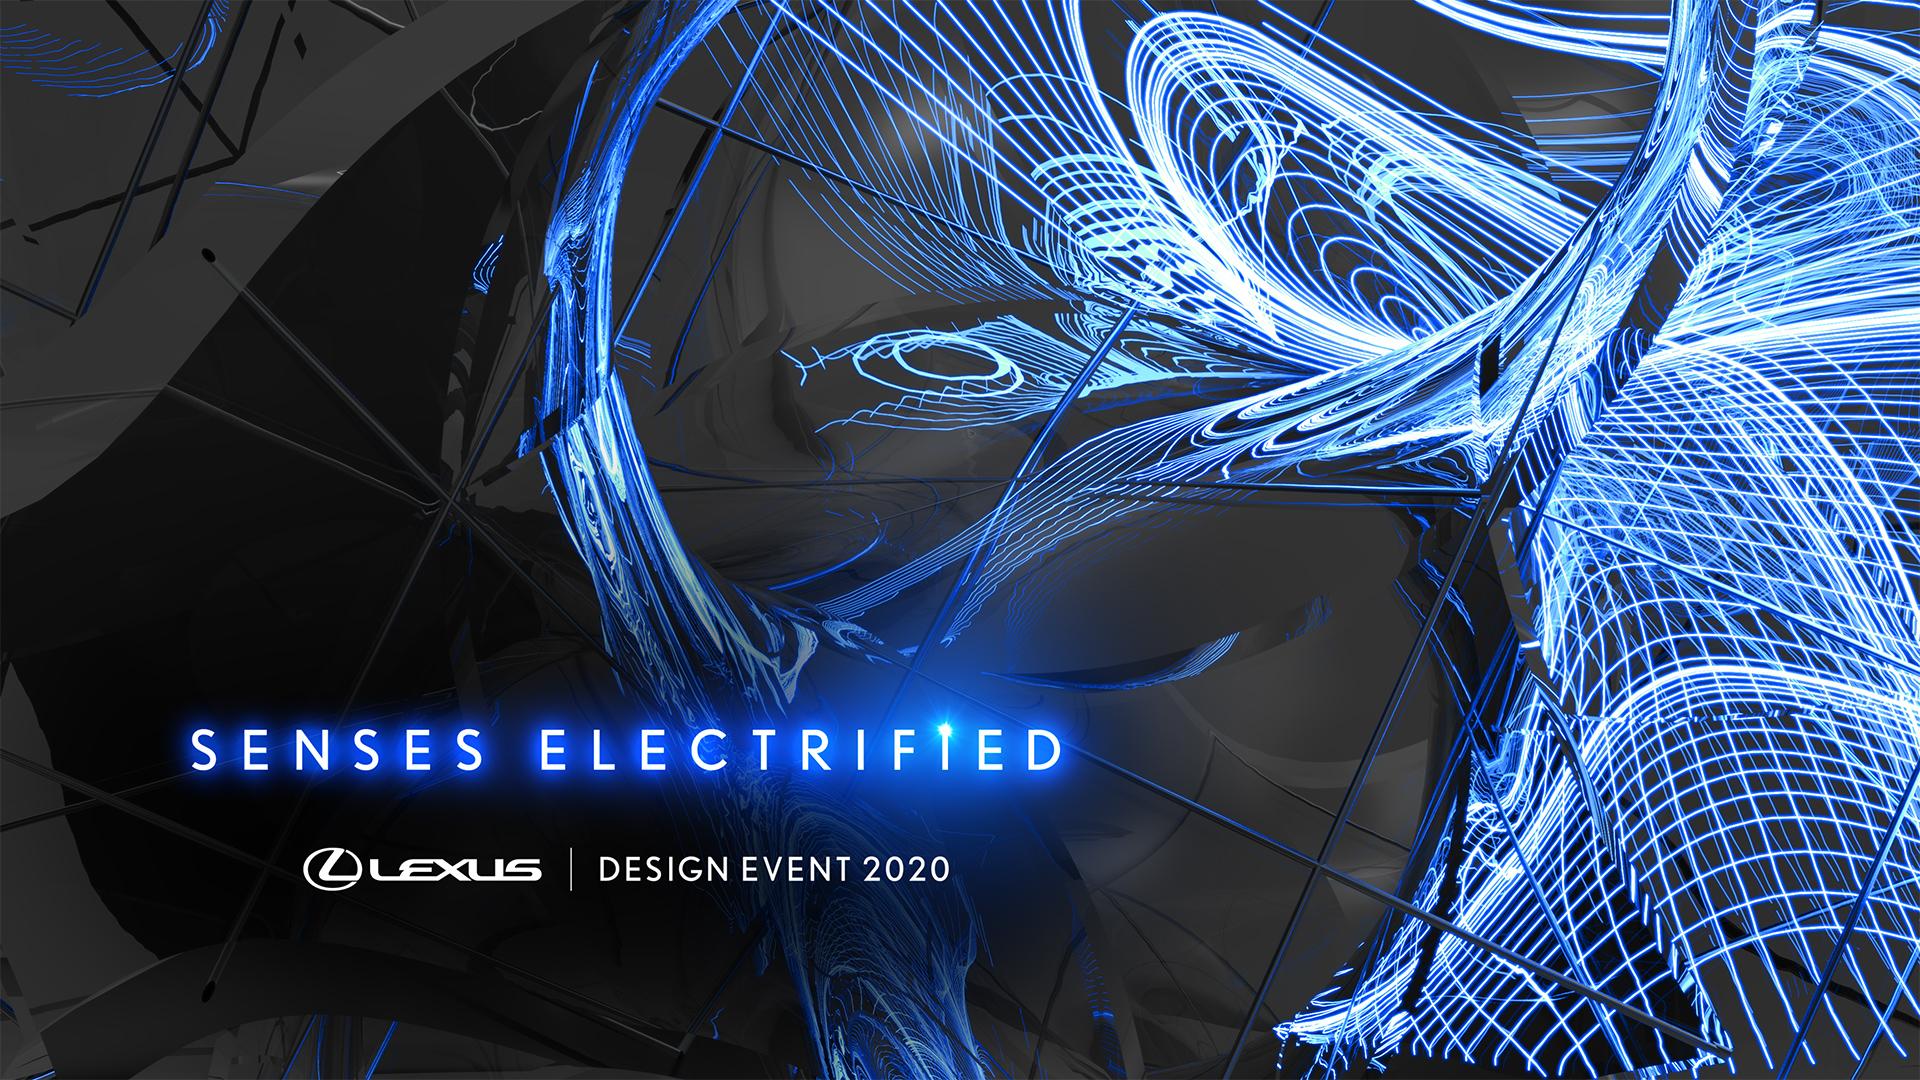 Lexus' Electrification Drives Sensory Experience at Milan Design Week 2020 - Image 4